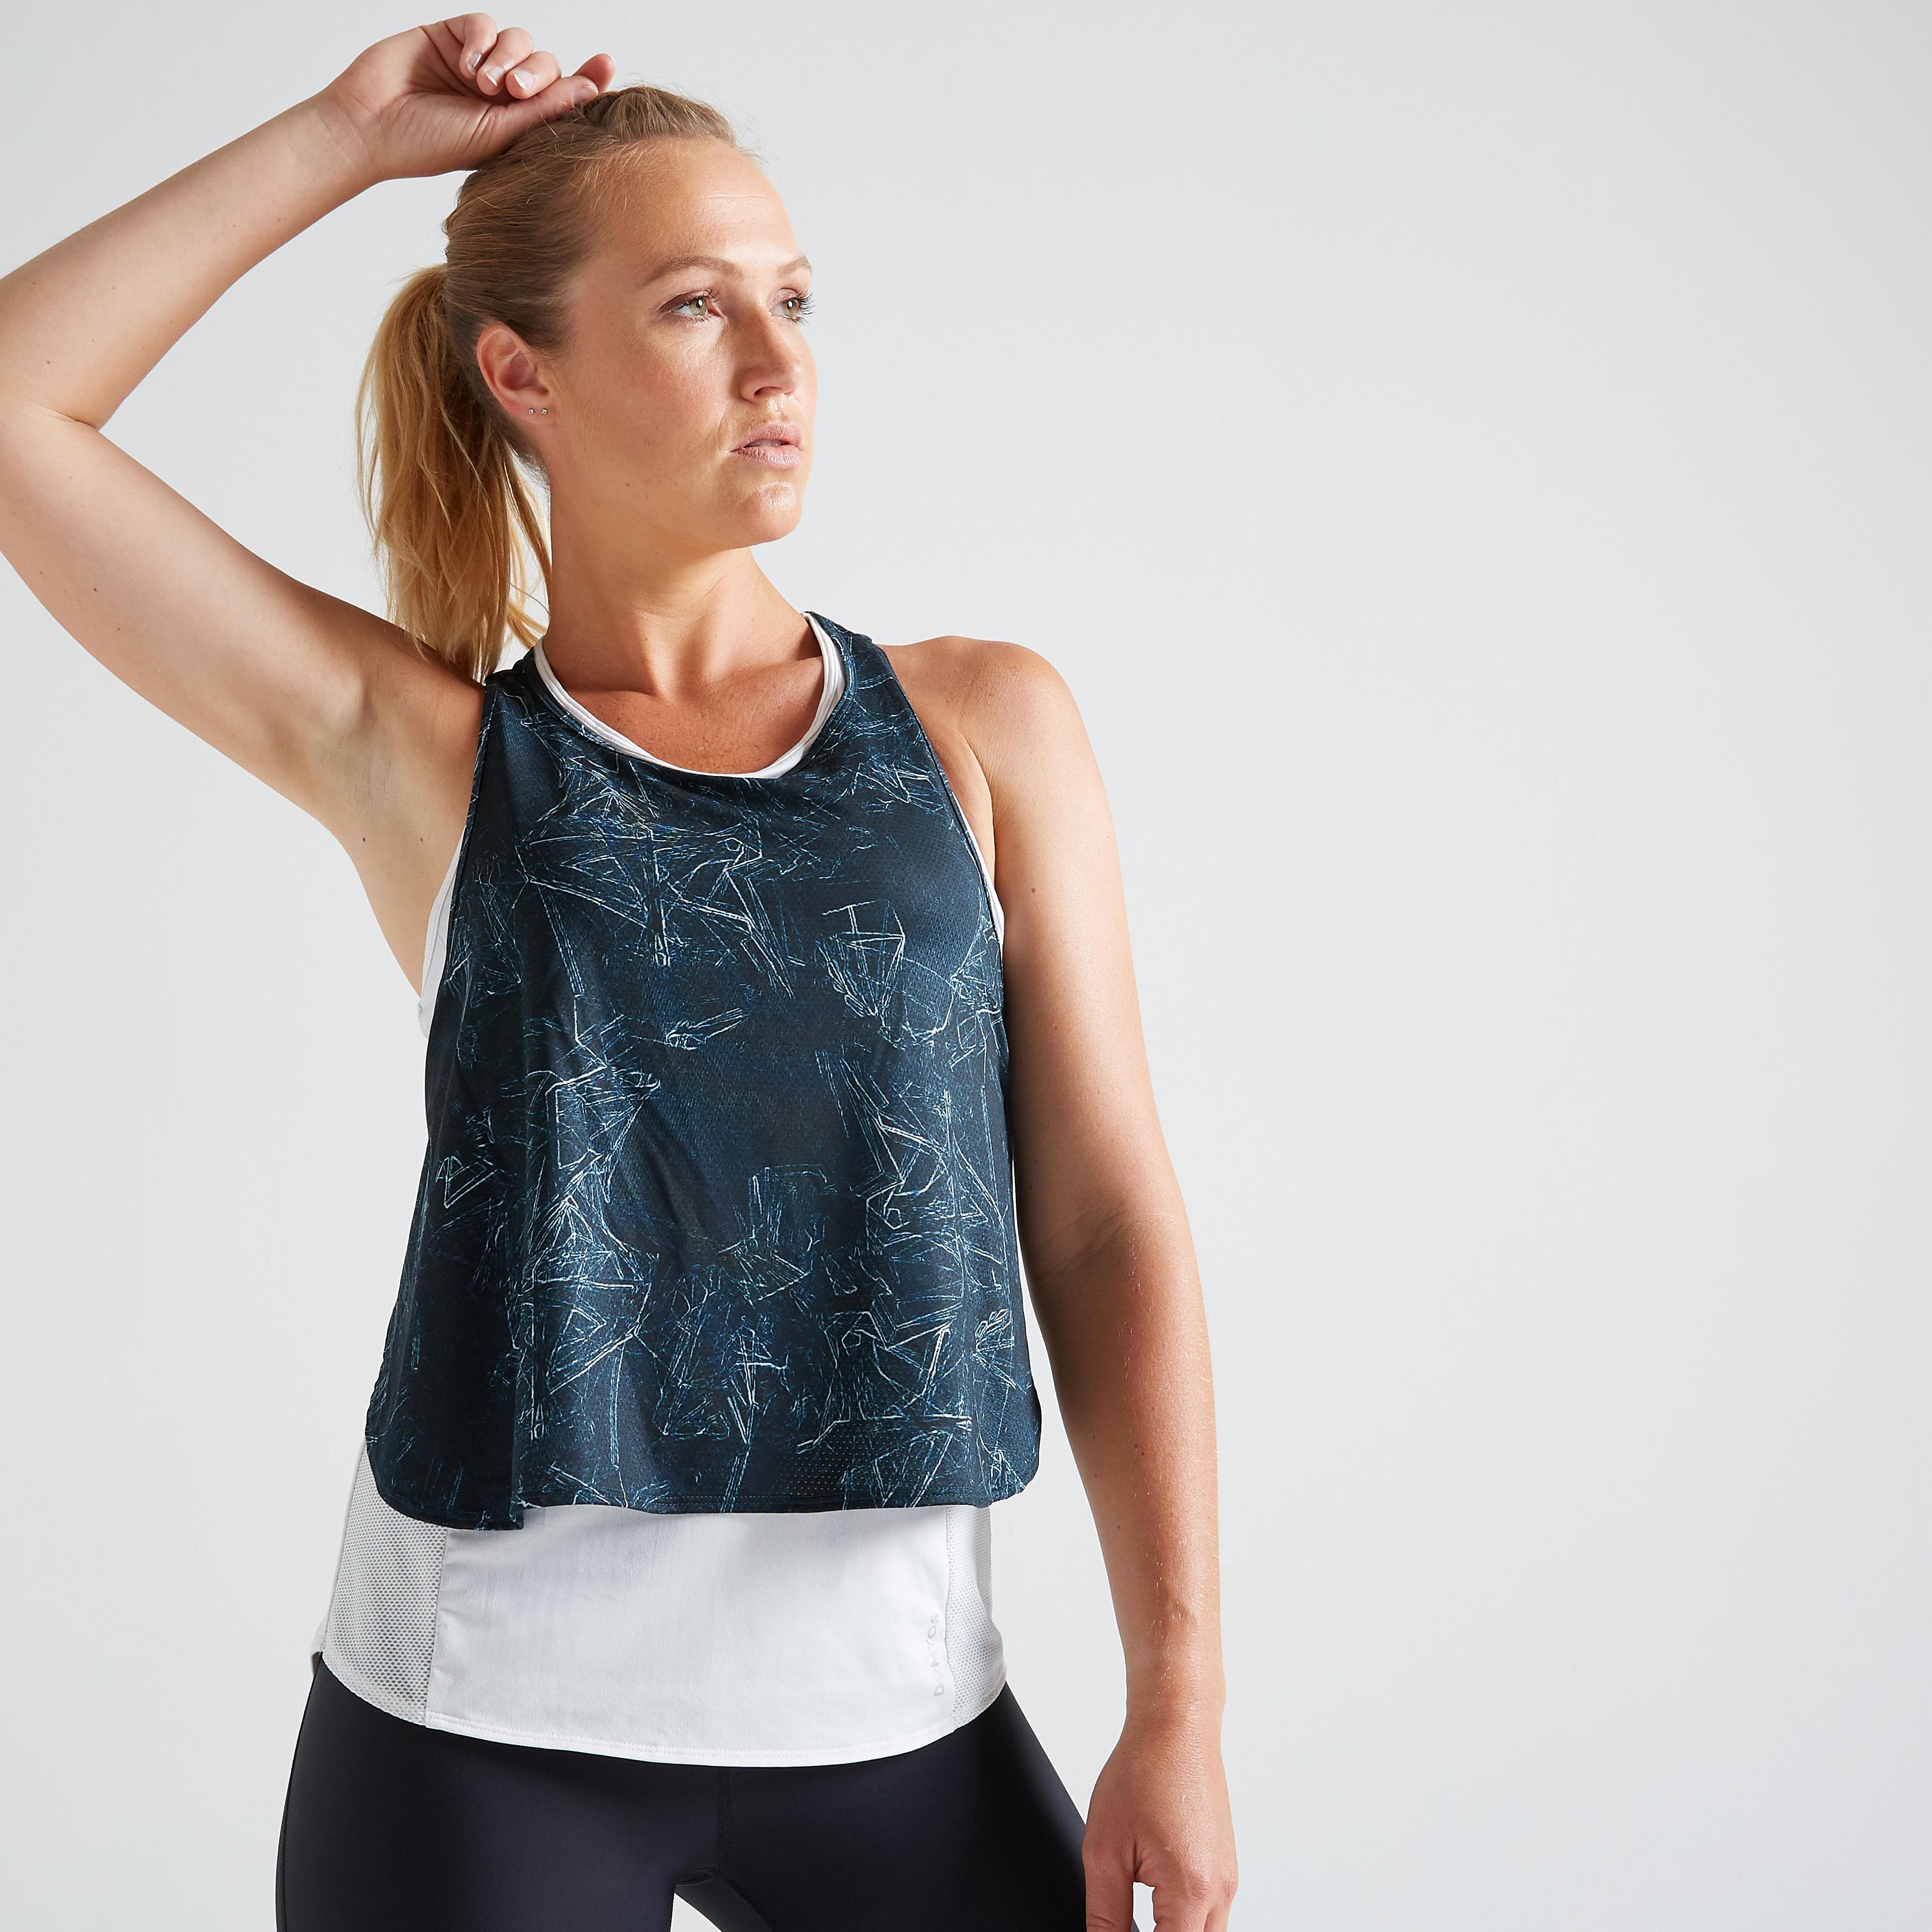 Top 3-in-1 FTA 520 Fitness Cardio Damen wei mit Print | Sportbekleidung > Sporttops | Domyos